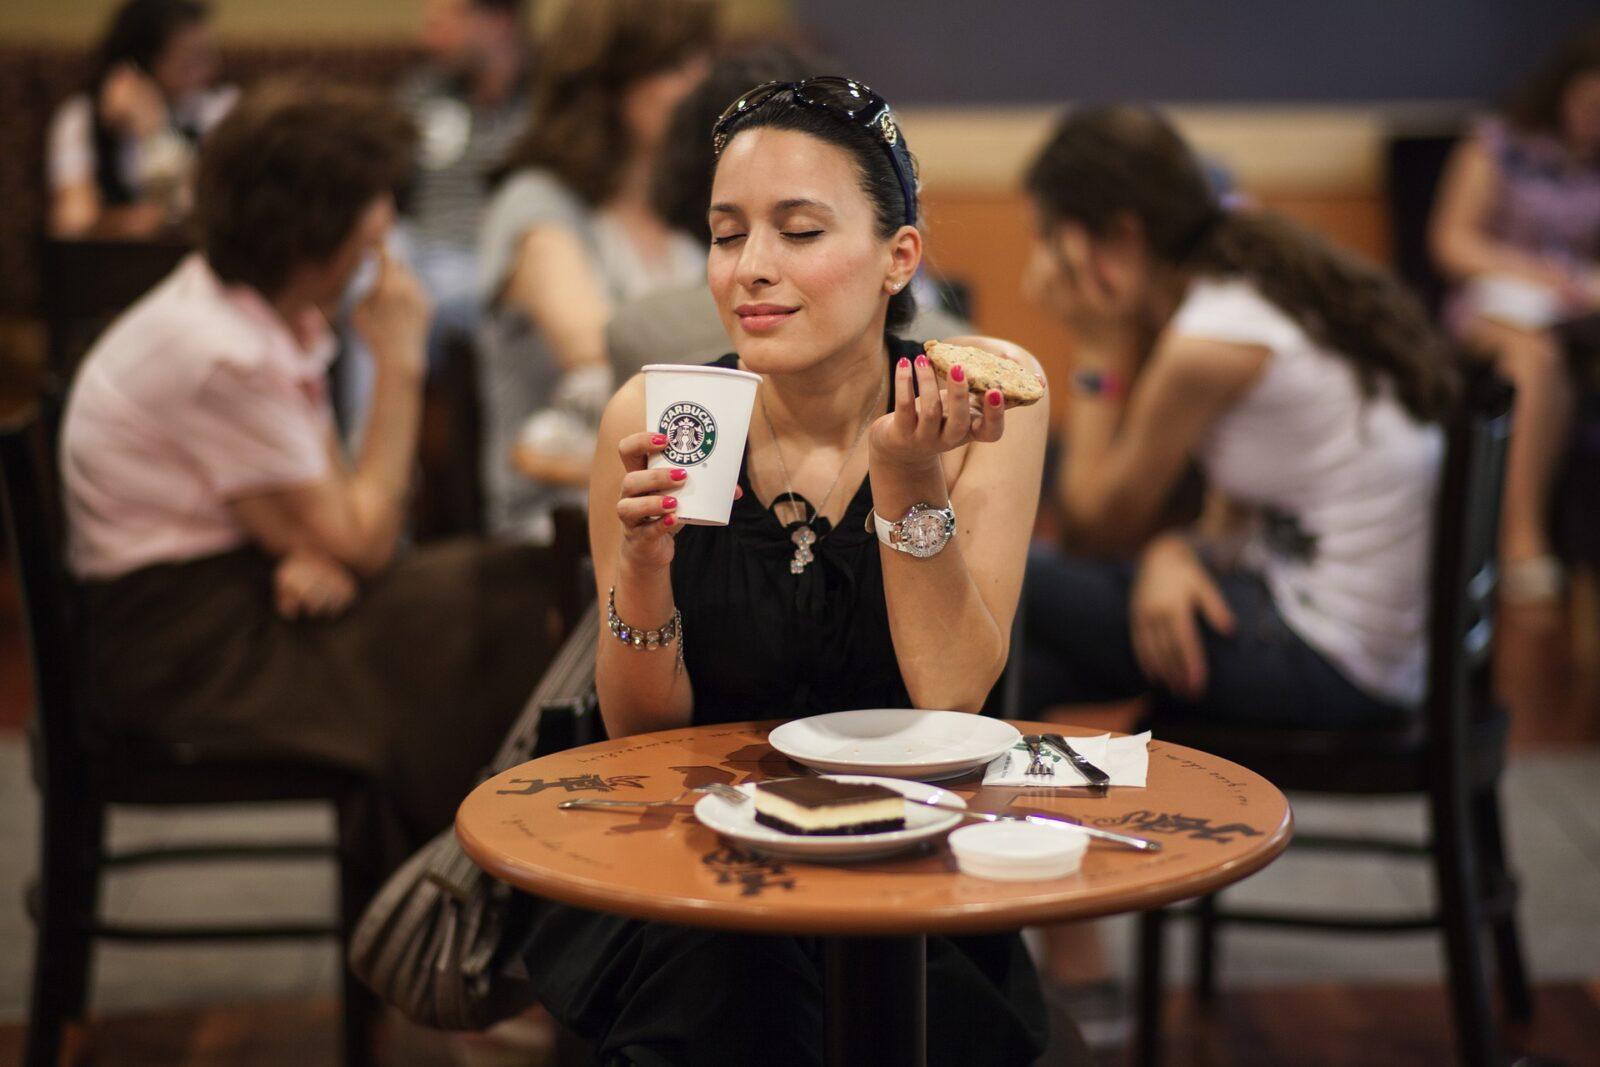 Woman drinks coffee in Starbucks